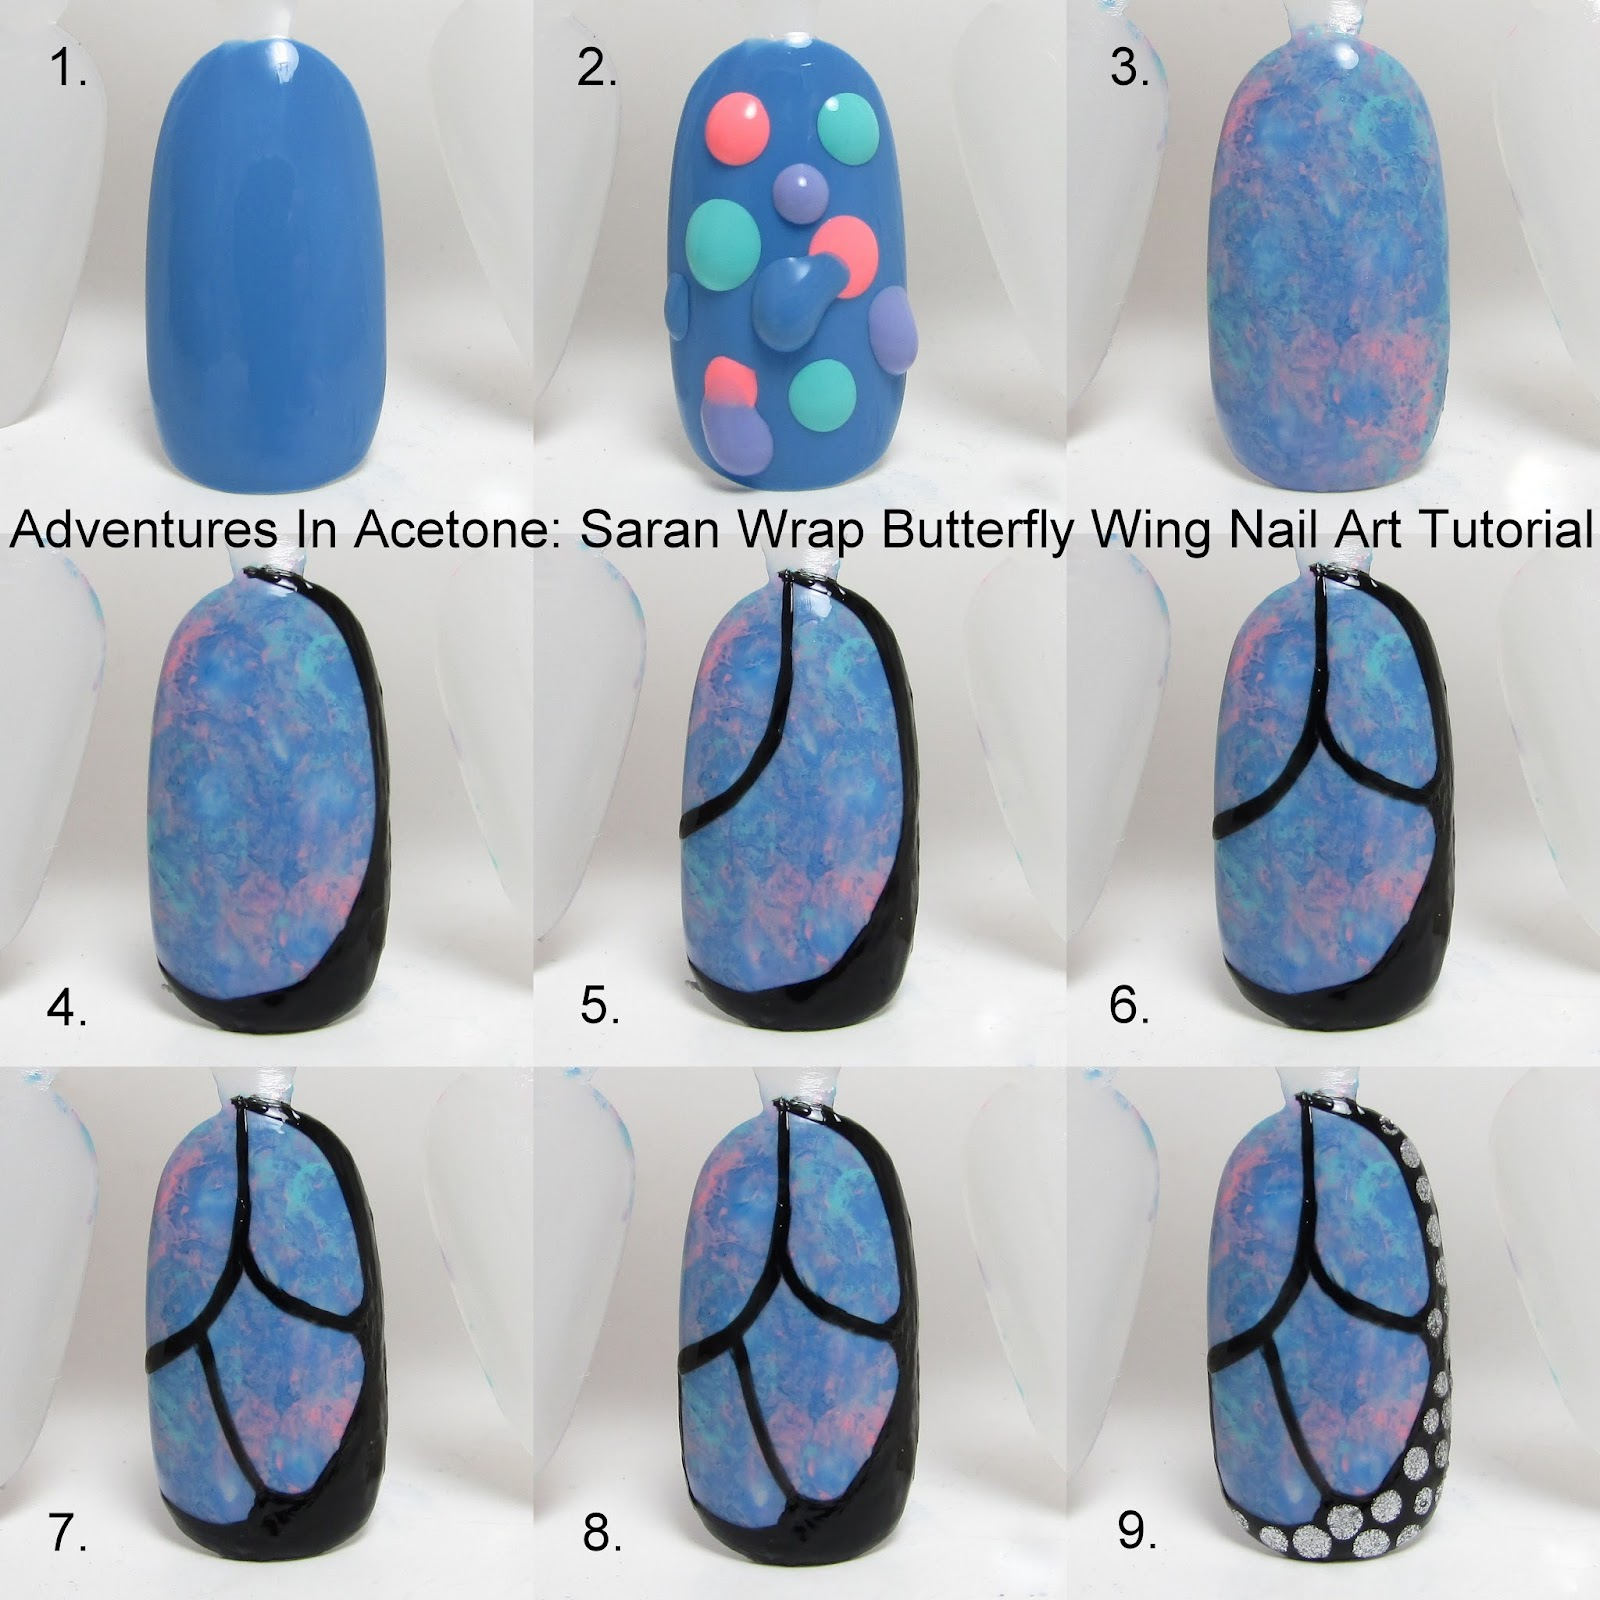 Nail Art Tutorials: Tutorial Tuesday: Butterfly Wing Saran Wrap Nail Art